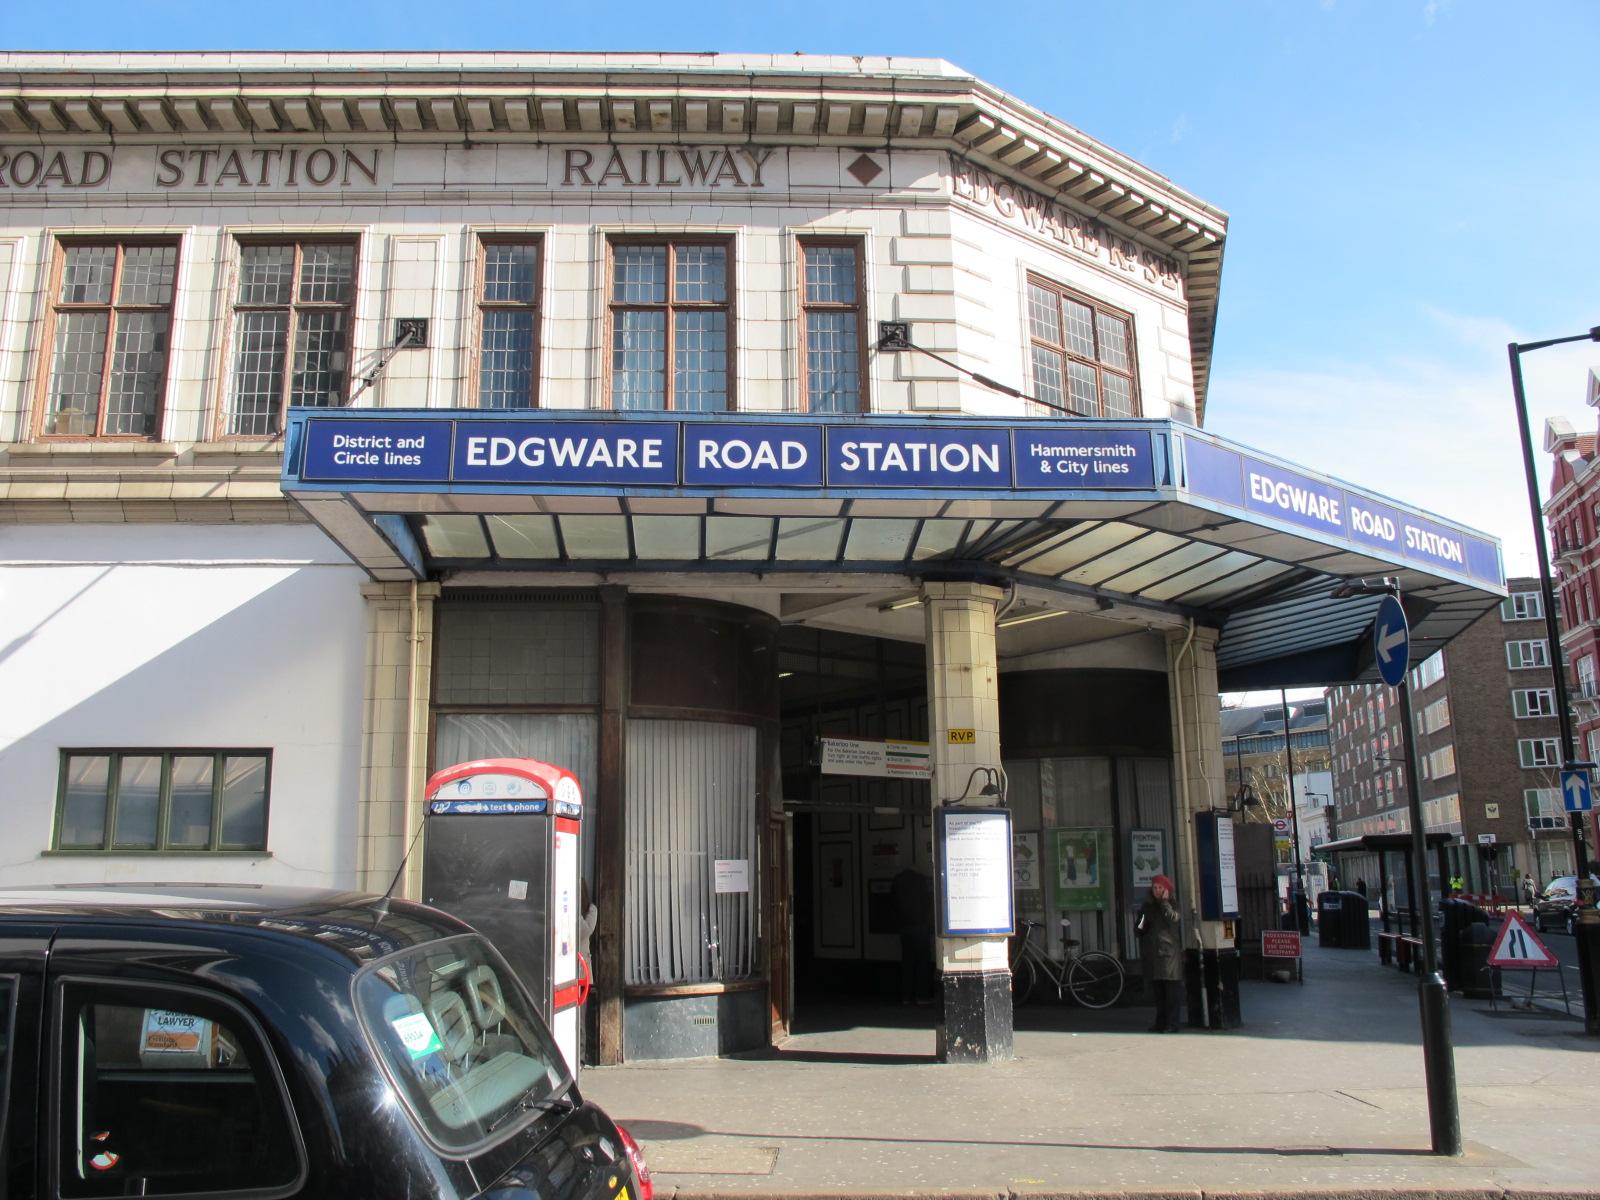 London-2012-london-underground-station-edgware-road